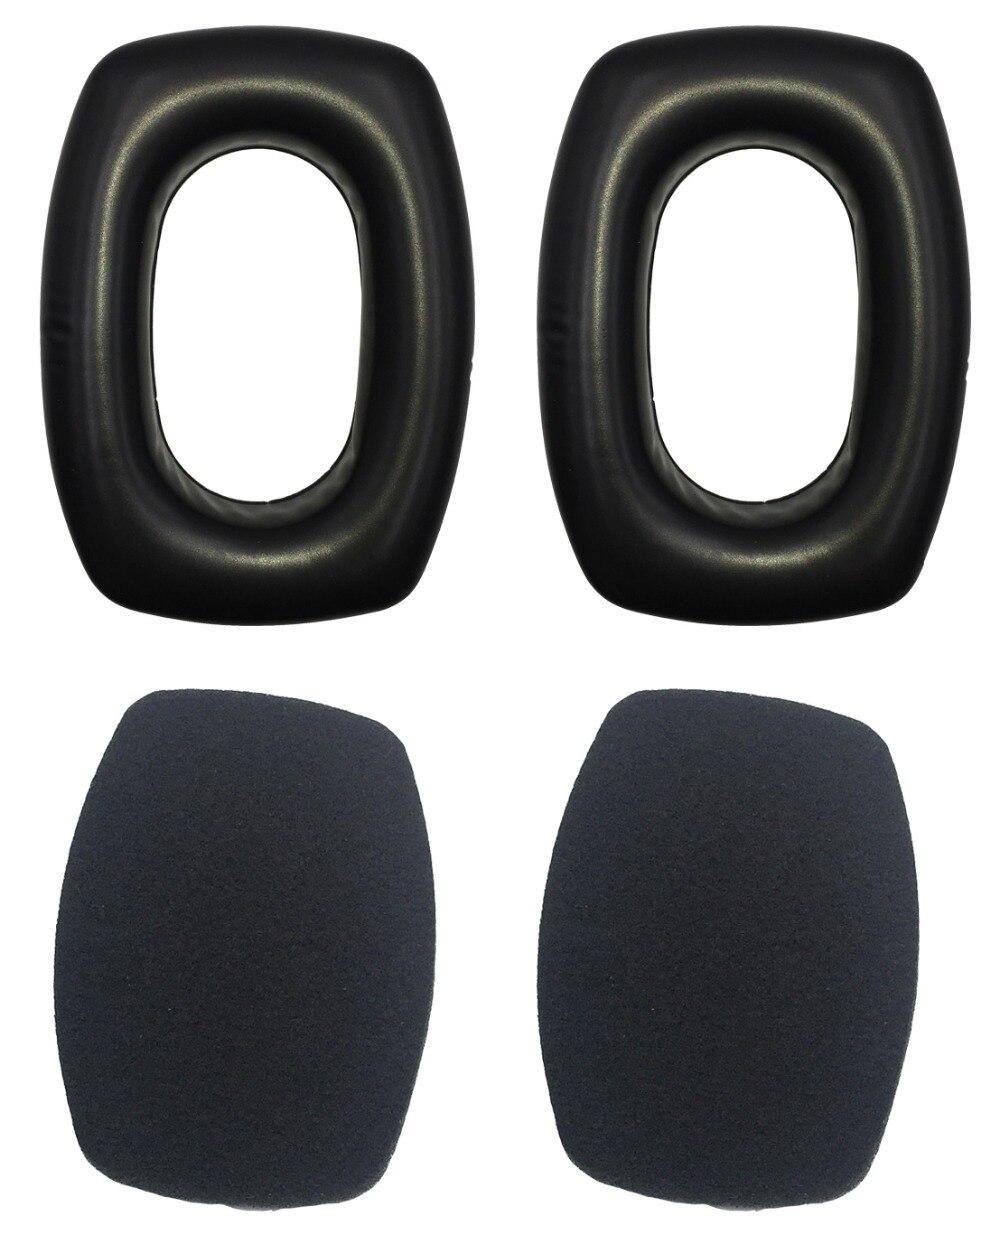 ED001 1